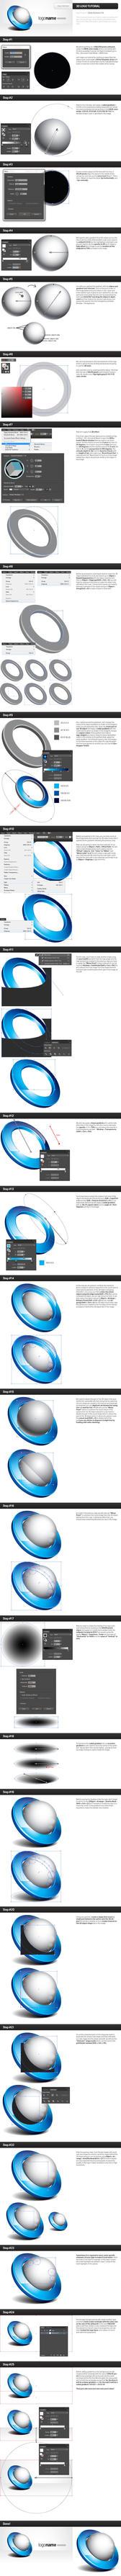 3D Vector Logo in Adobe Illustrator - Tutorial by Crealextion